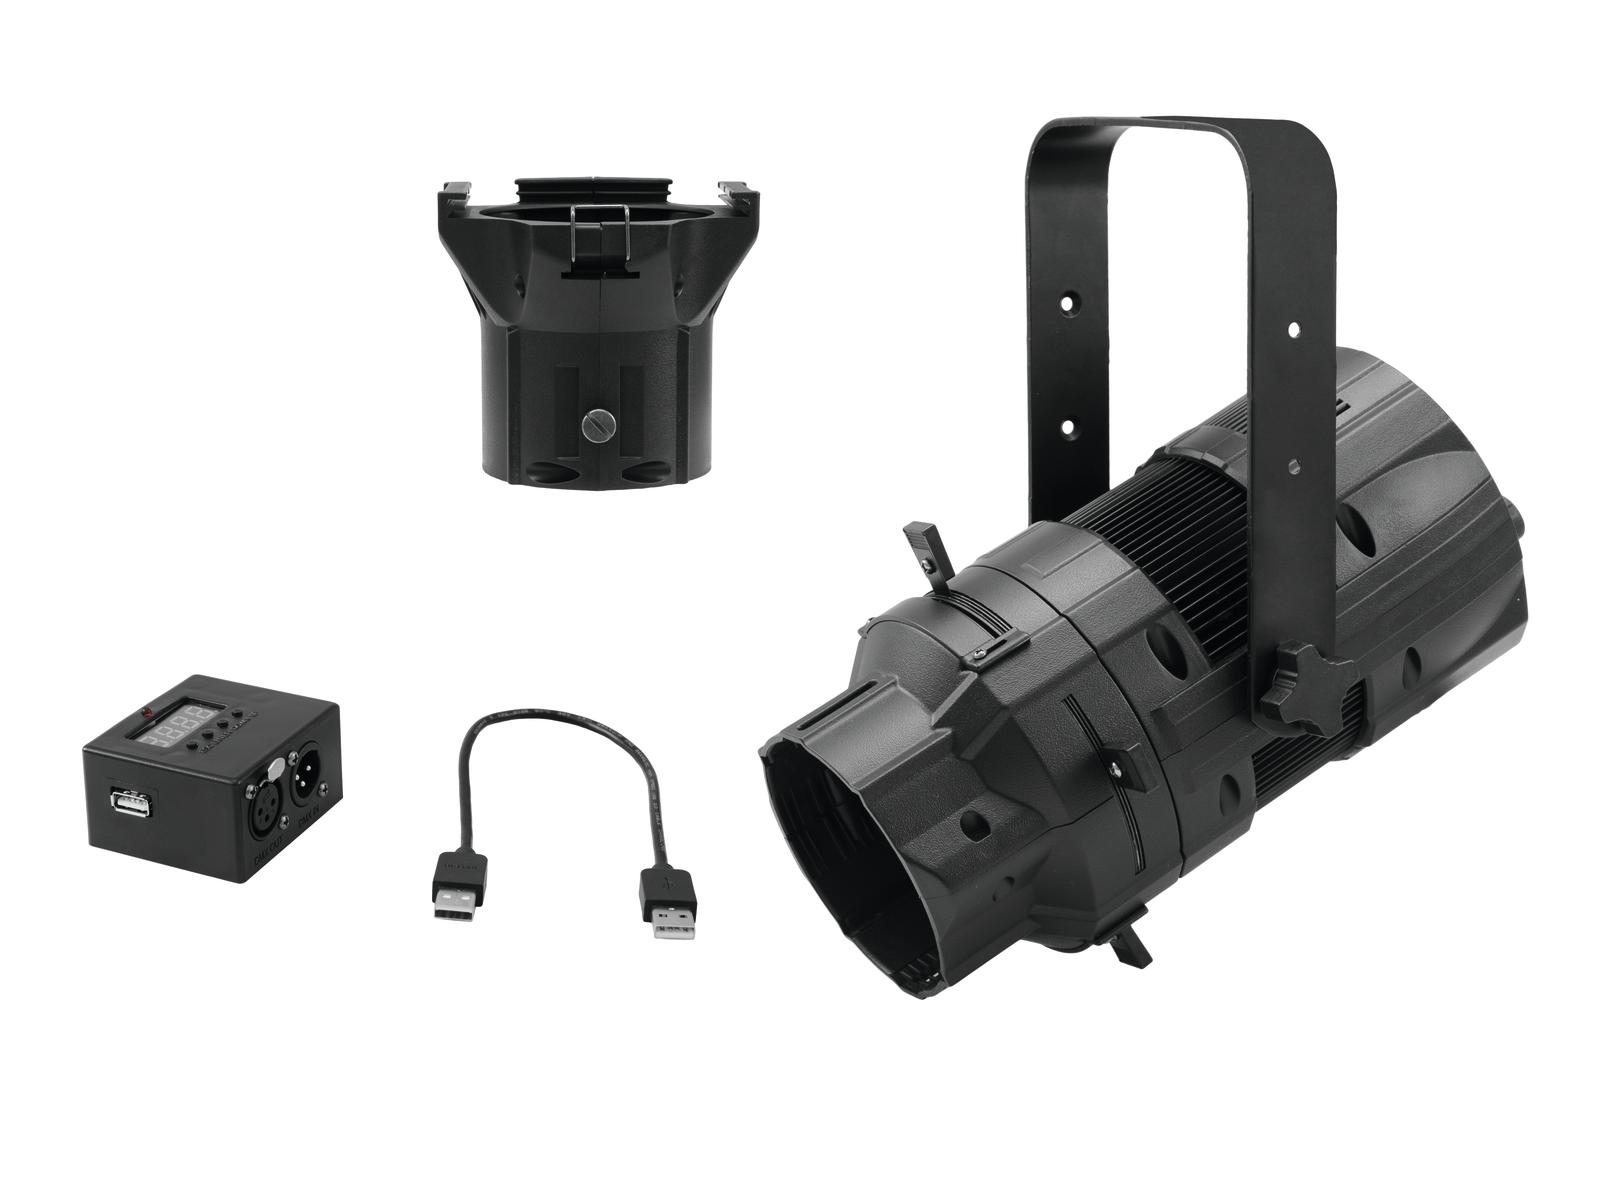 EUROLITE LED di Set PFE-50 + Lente di tubo 36° + Interfaccia DMX